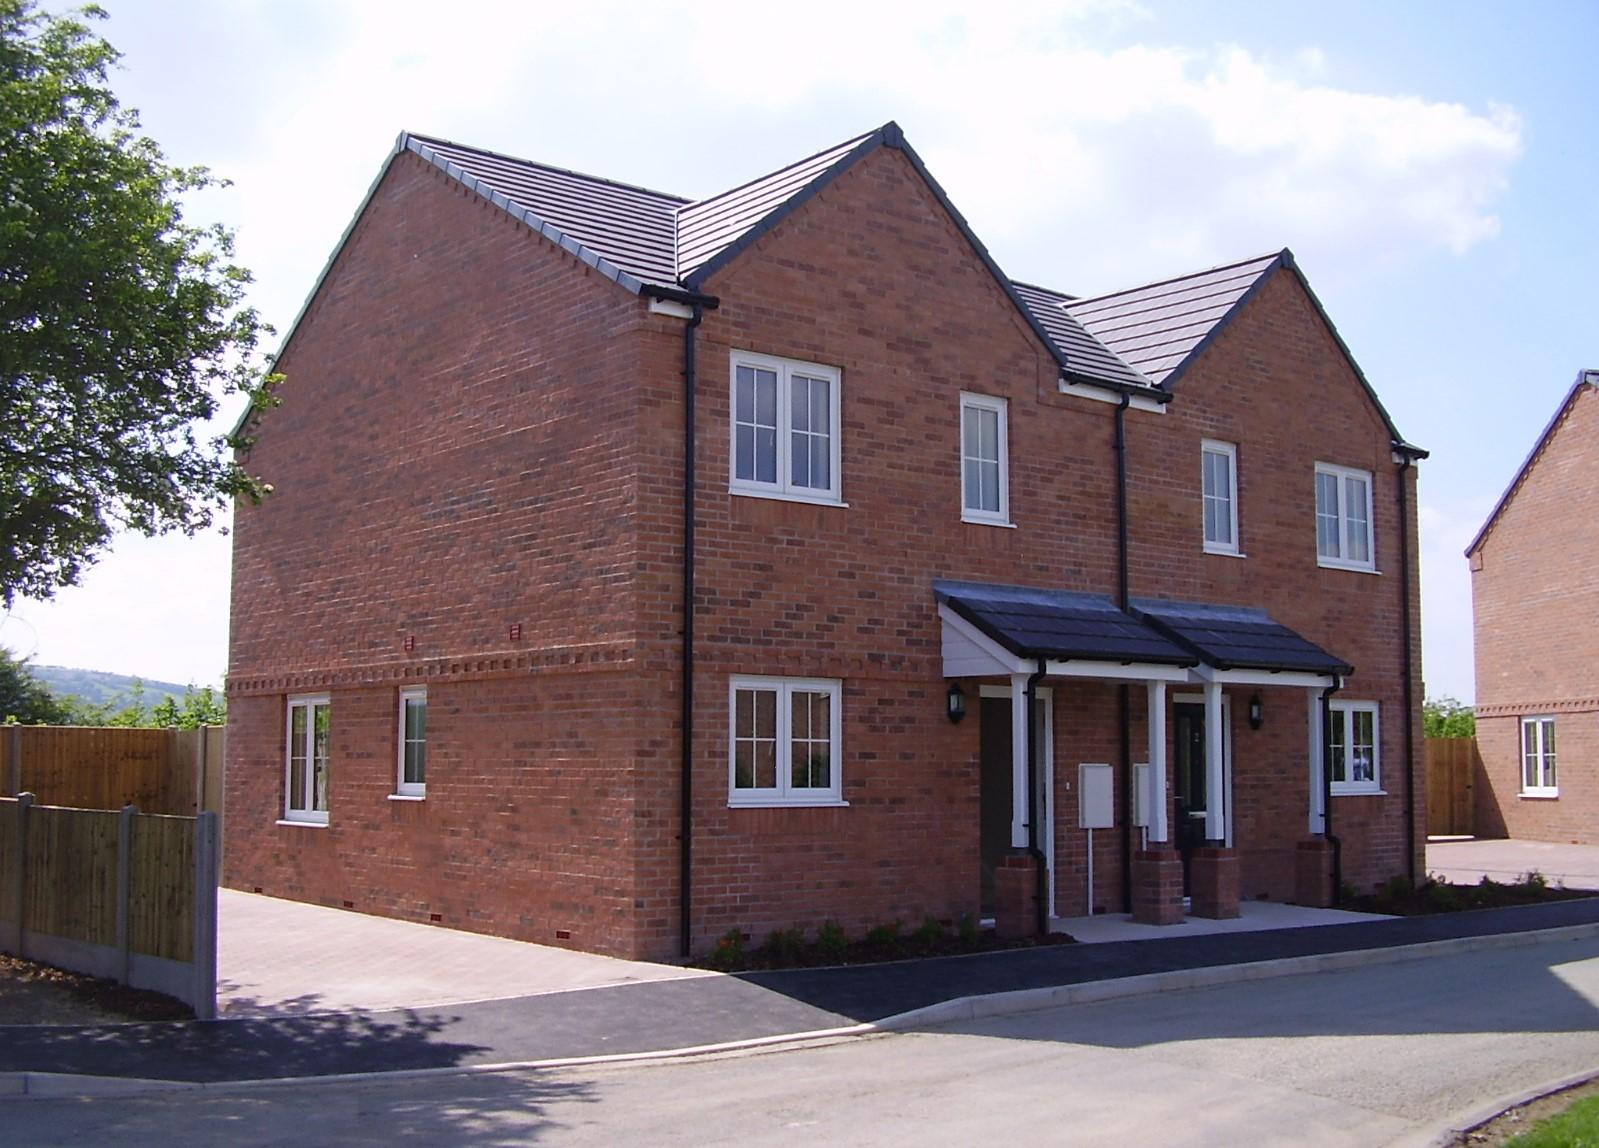 Lydham, Poolshead Corner 1